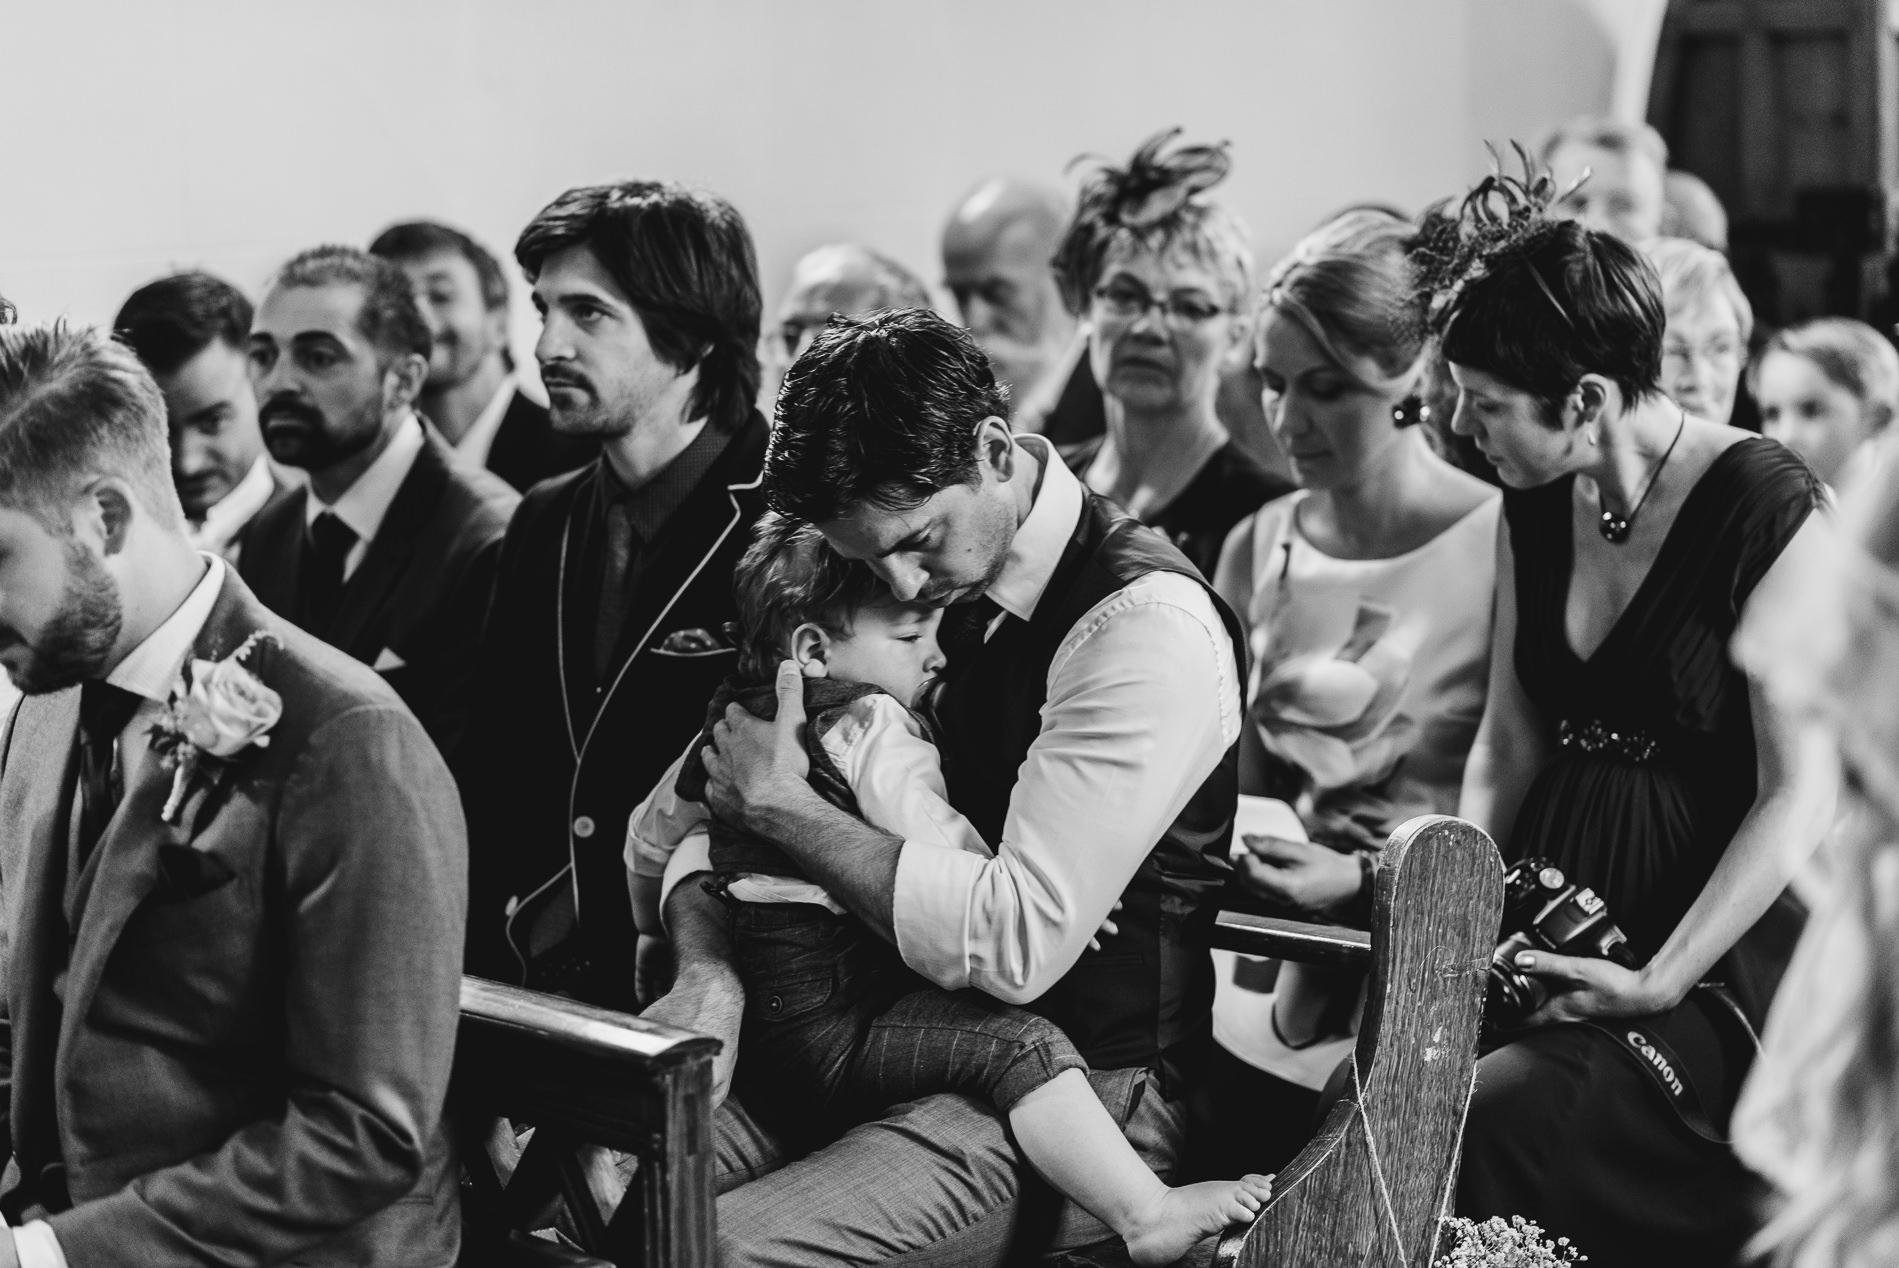 bohemian_wedding_lawshall_church_garden66